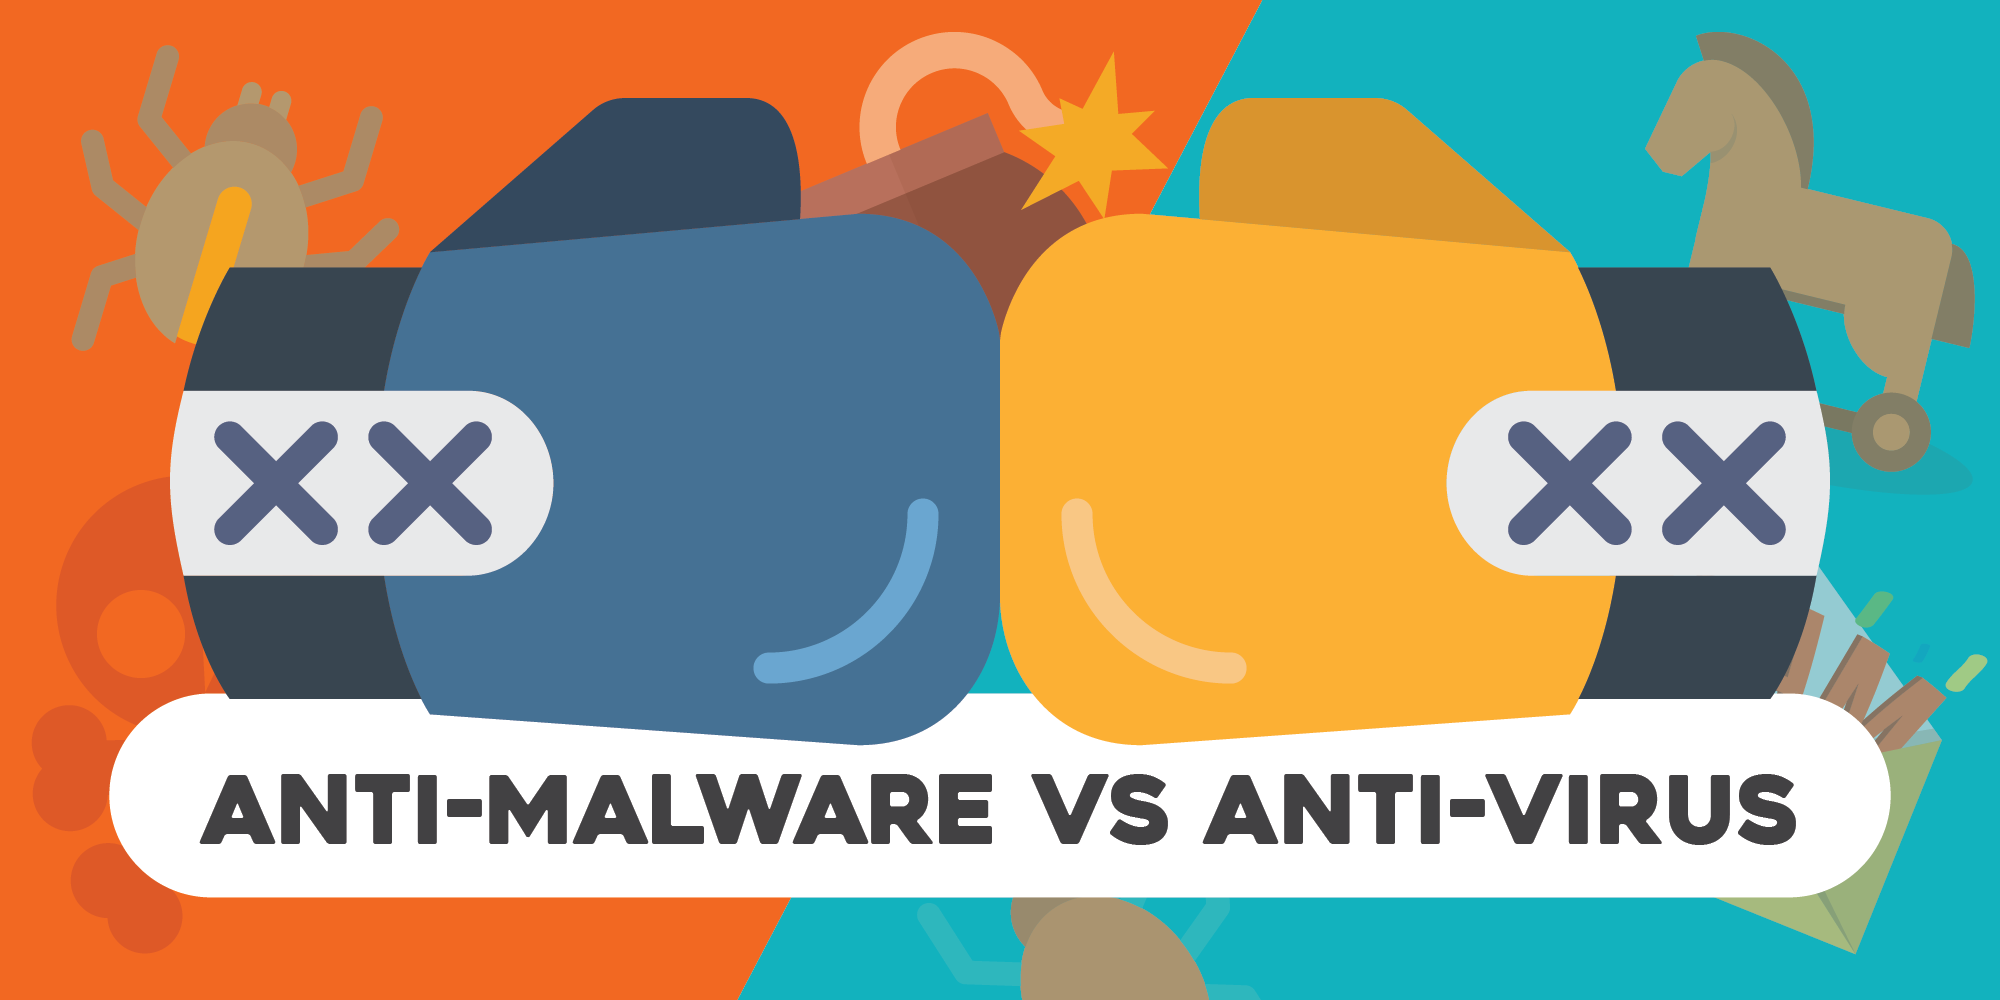 antivirus vs anti malware